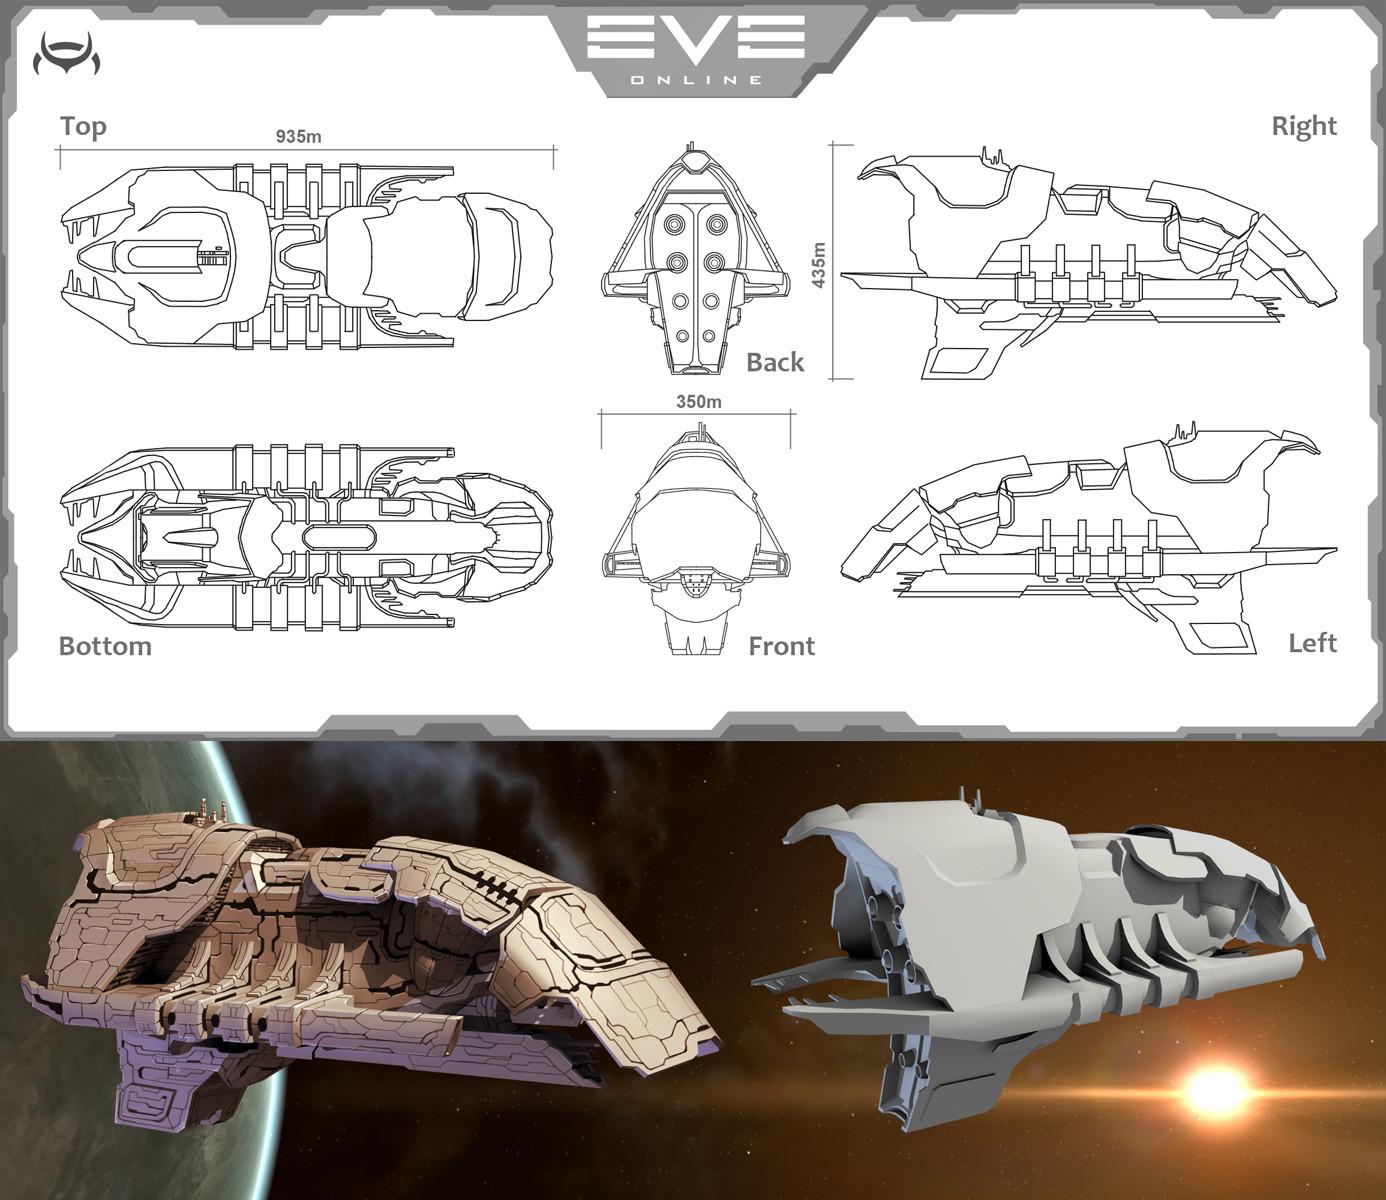 Semyon Bryzgunov - EVE Online create a star ship contest 2010